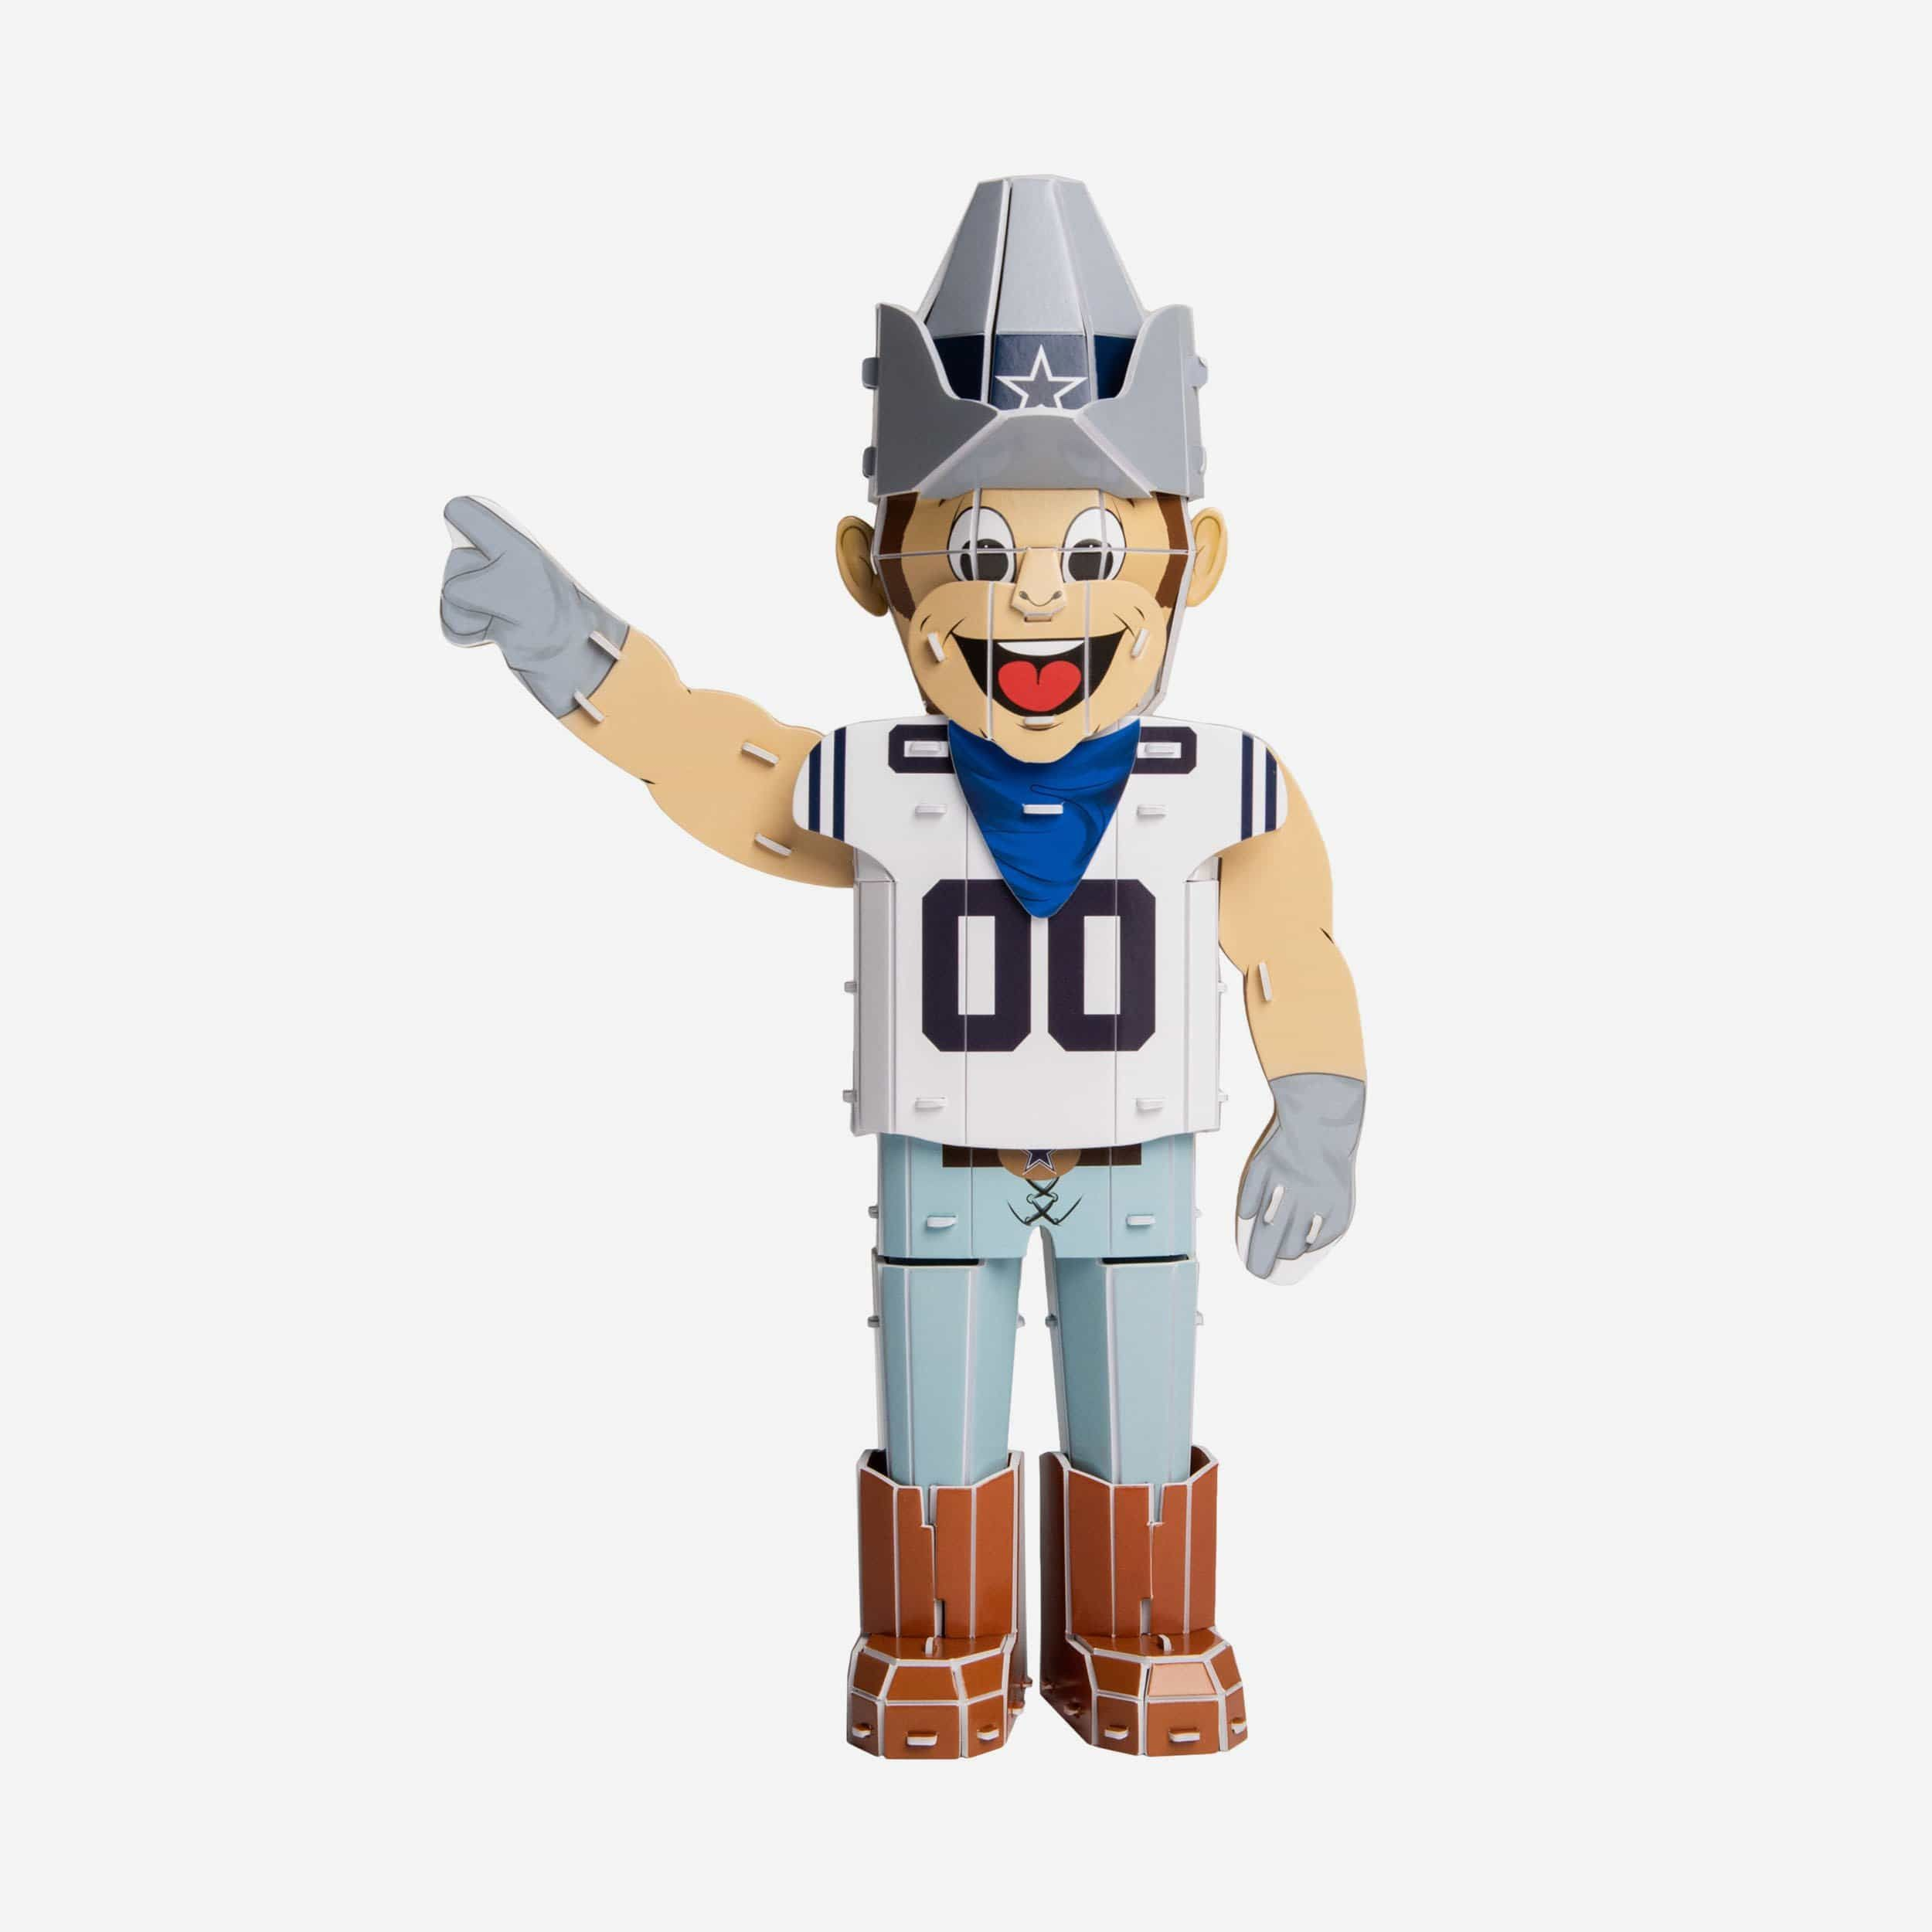 Rowdy Dallas Cowboys Pzlz Mascot In 2021 Dallas Cowboys Football Team Dallas Cowboys Cowboys